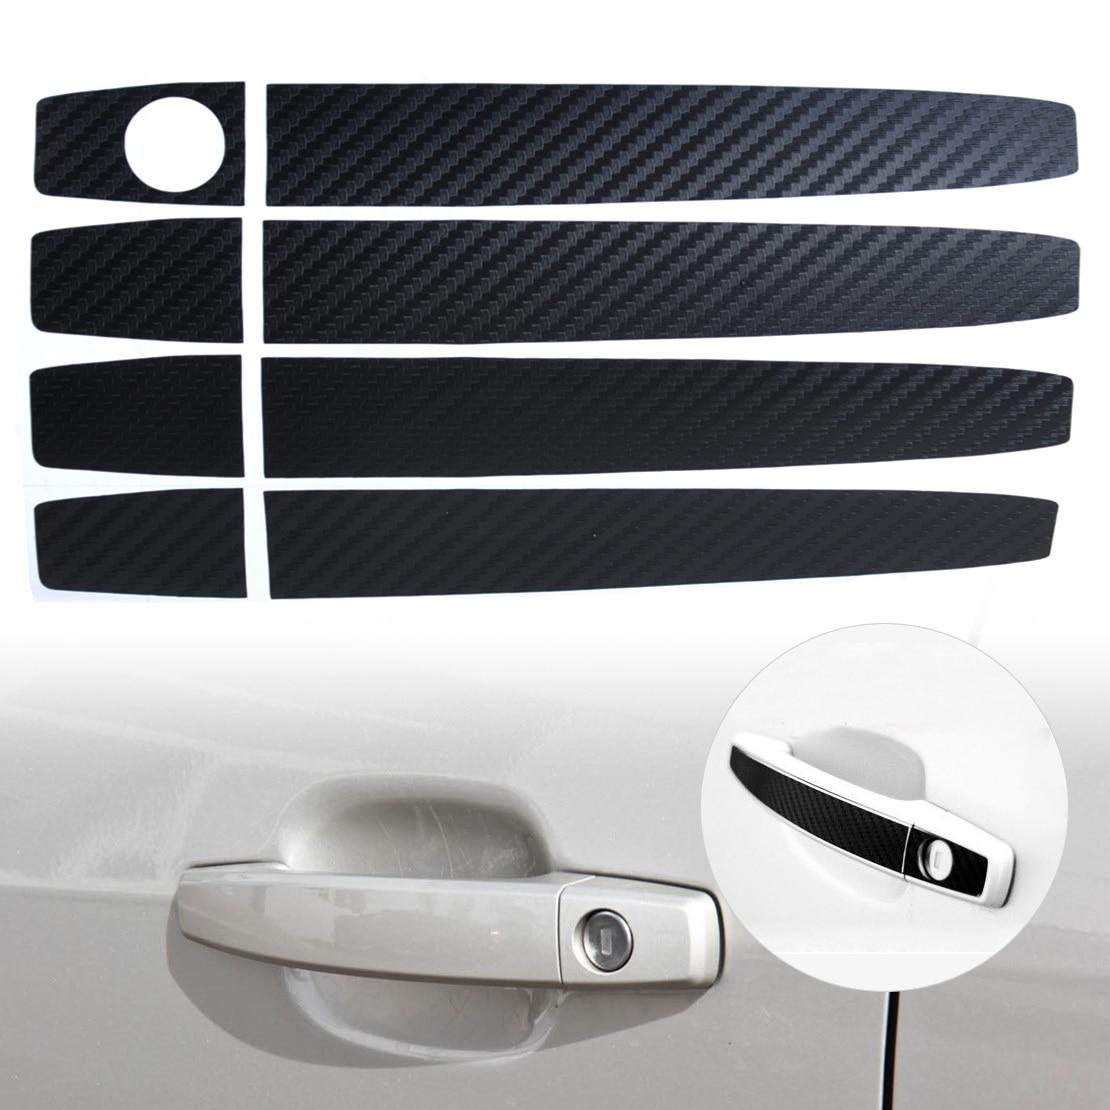 Fuel Gauge Sticker Funny Jdm Vinyl Car Sticker For Chevrolet Cruze Trax Aveo Lova Sail Epica Captiva Malibu Volt Camaro Cobalt Exterior Accessories Automobiles & Motorcycles